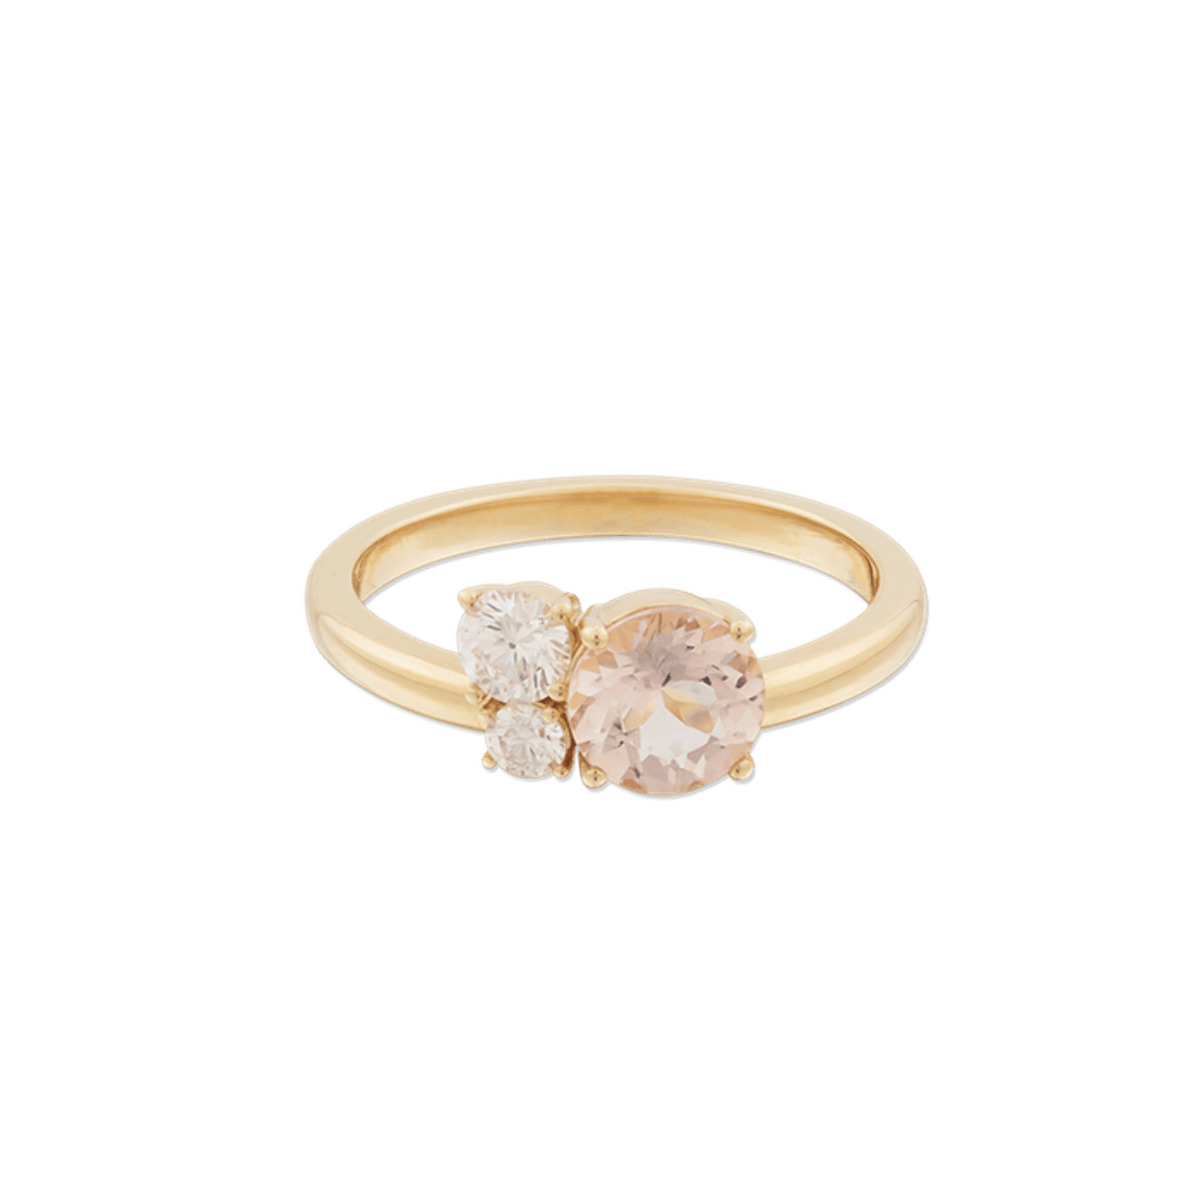 Round Cut Ring